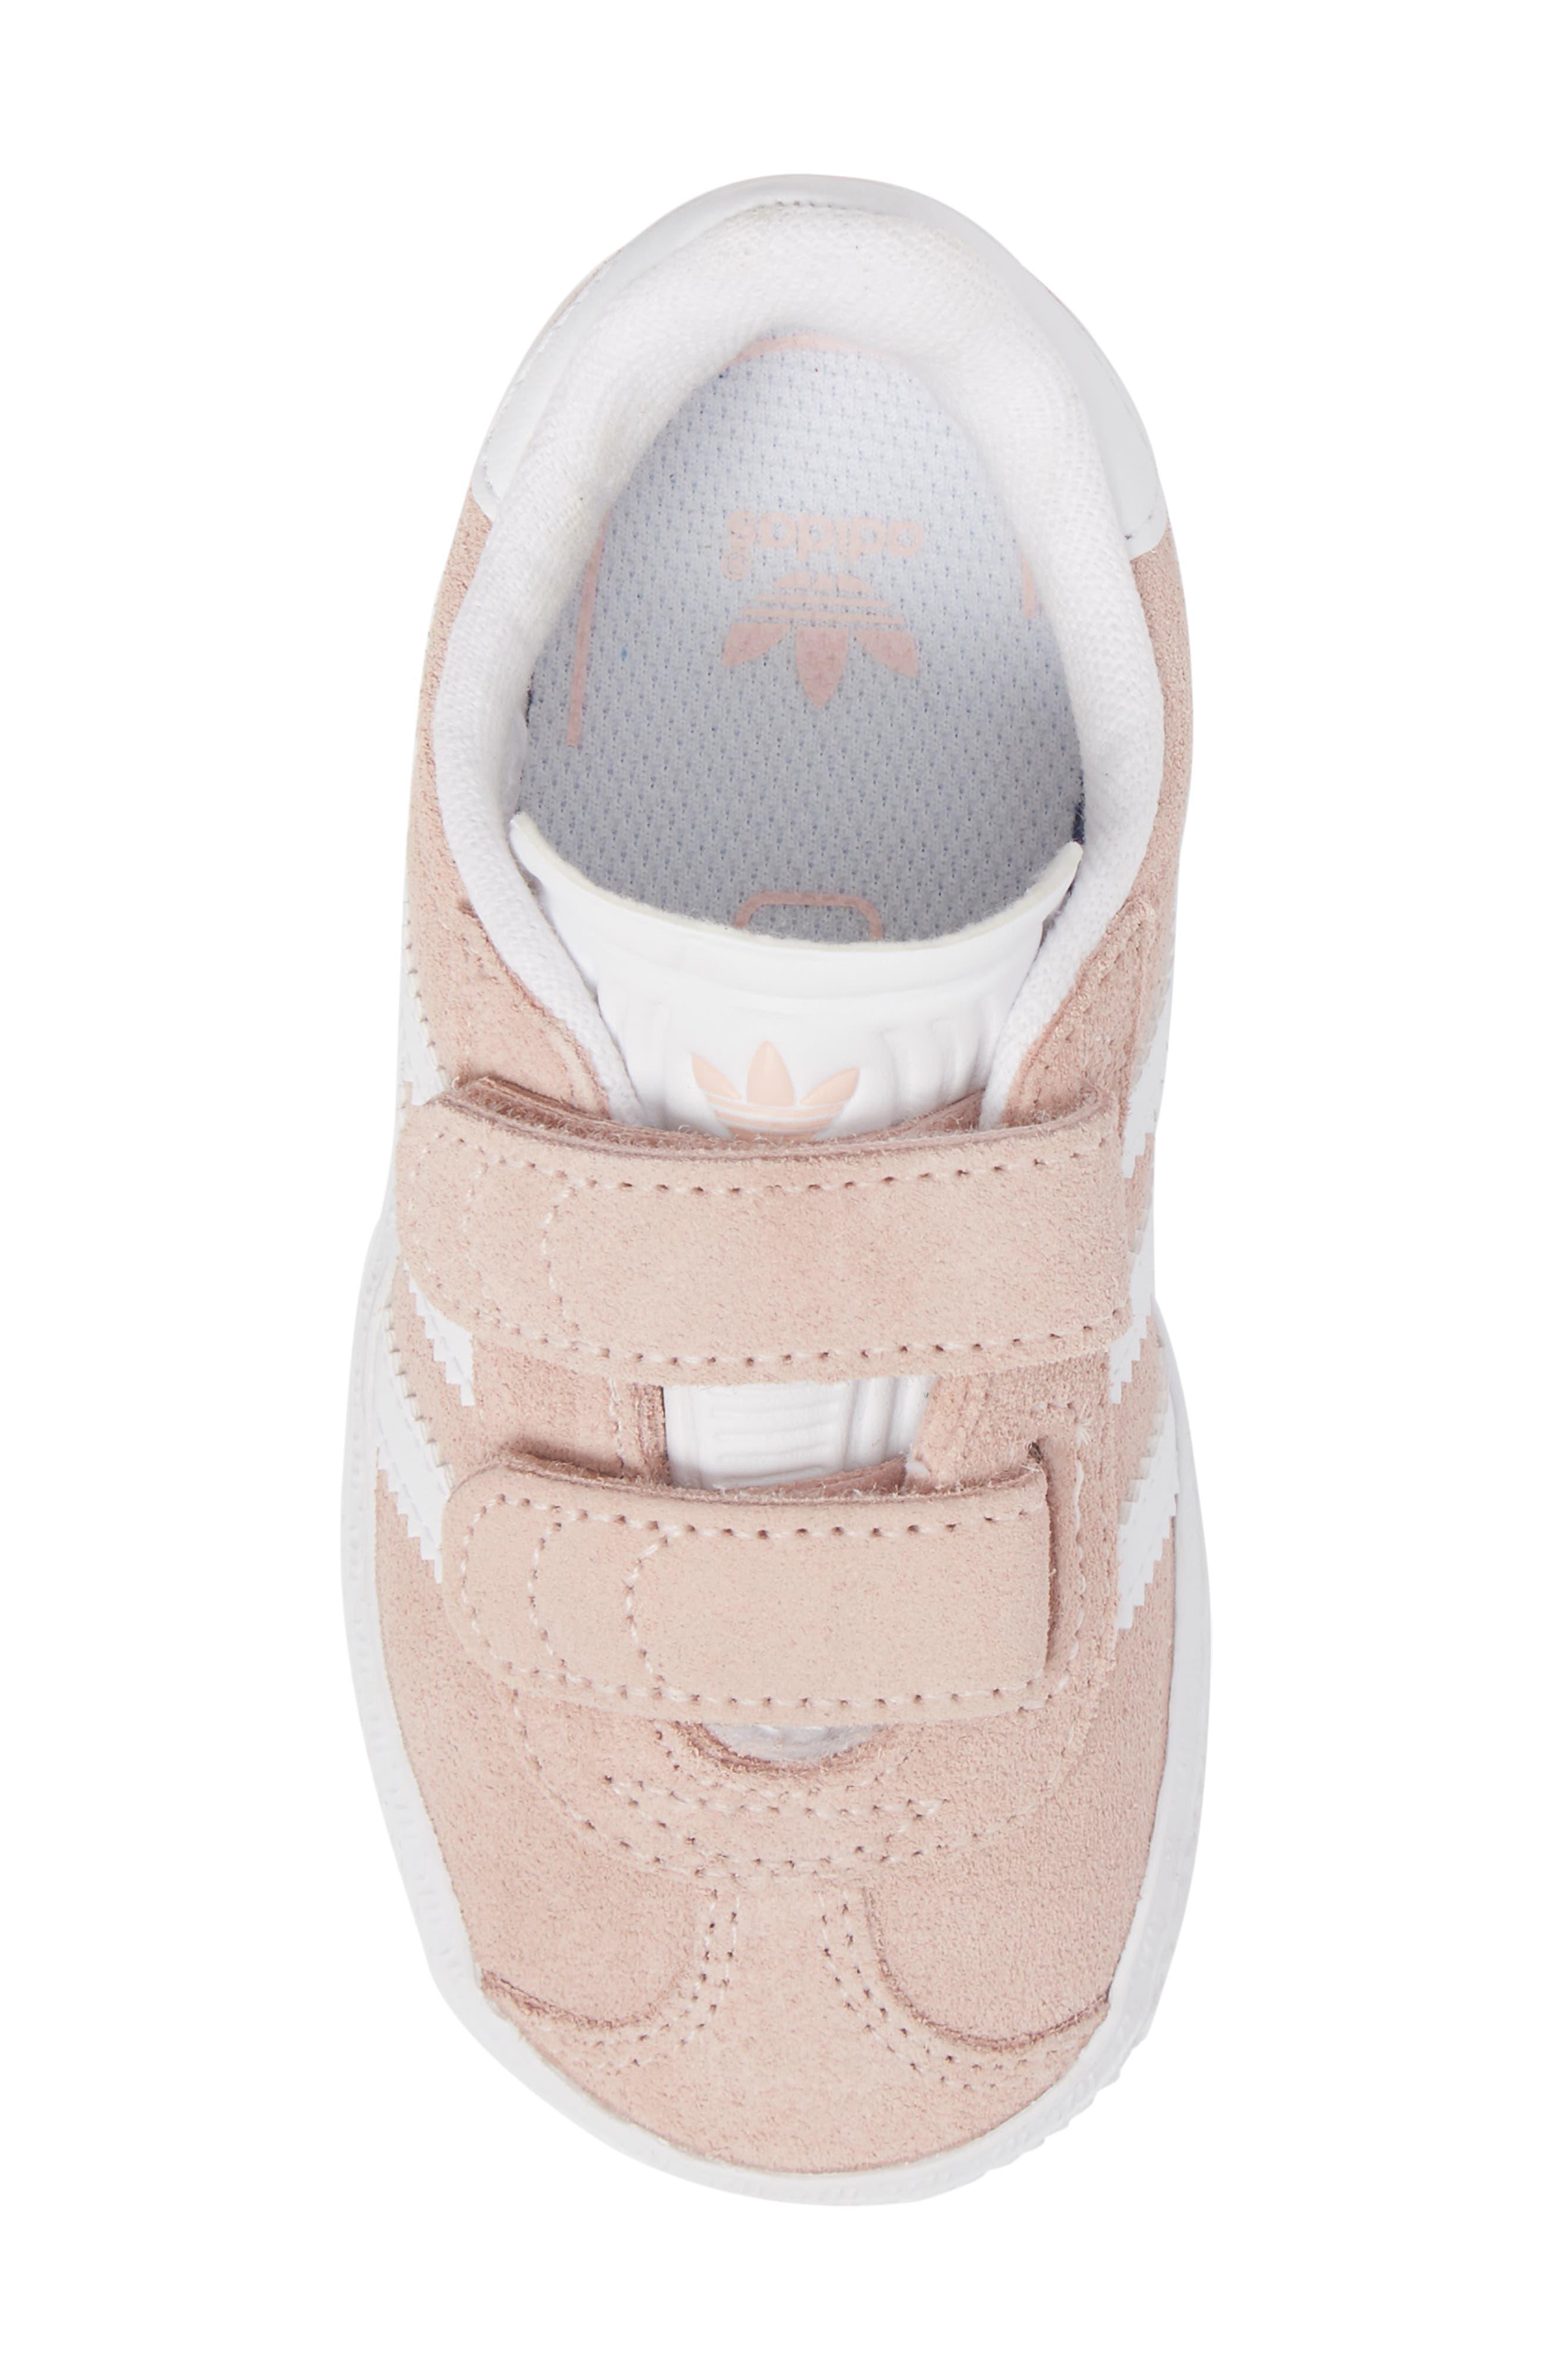 Gazelle Sneaker,                             Alternate thumbnail 5, color,                             Icey Pink / White / White